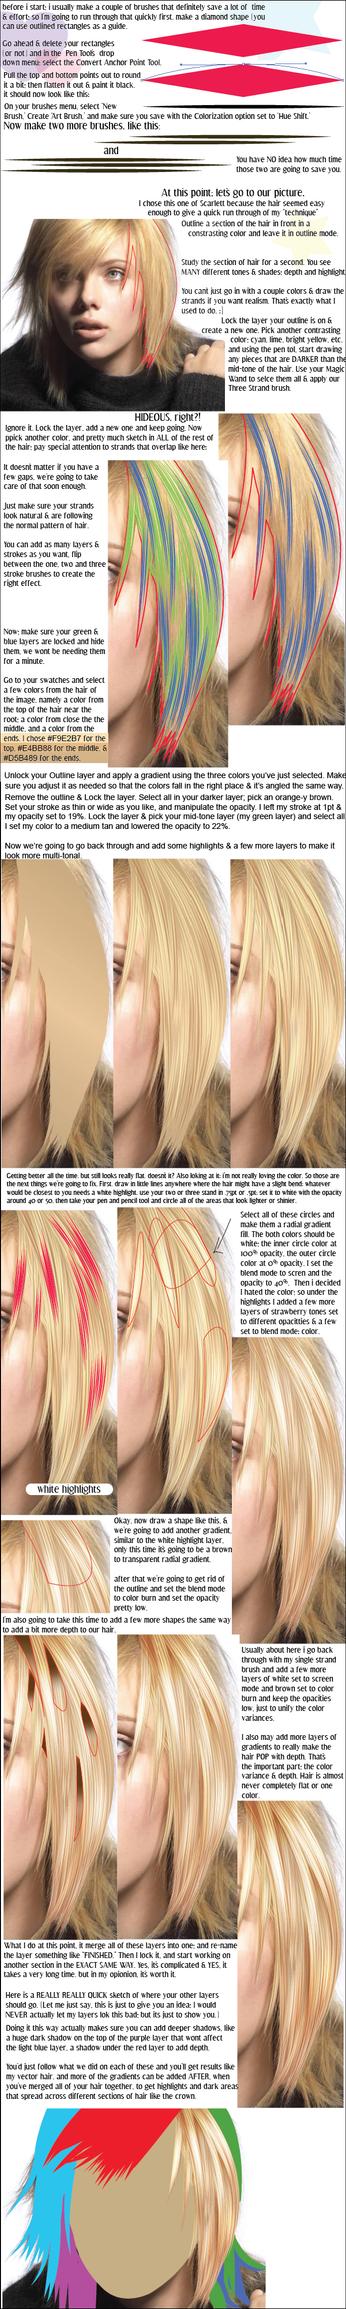 vector hair tutorial by smashbabyy